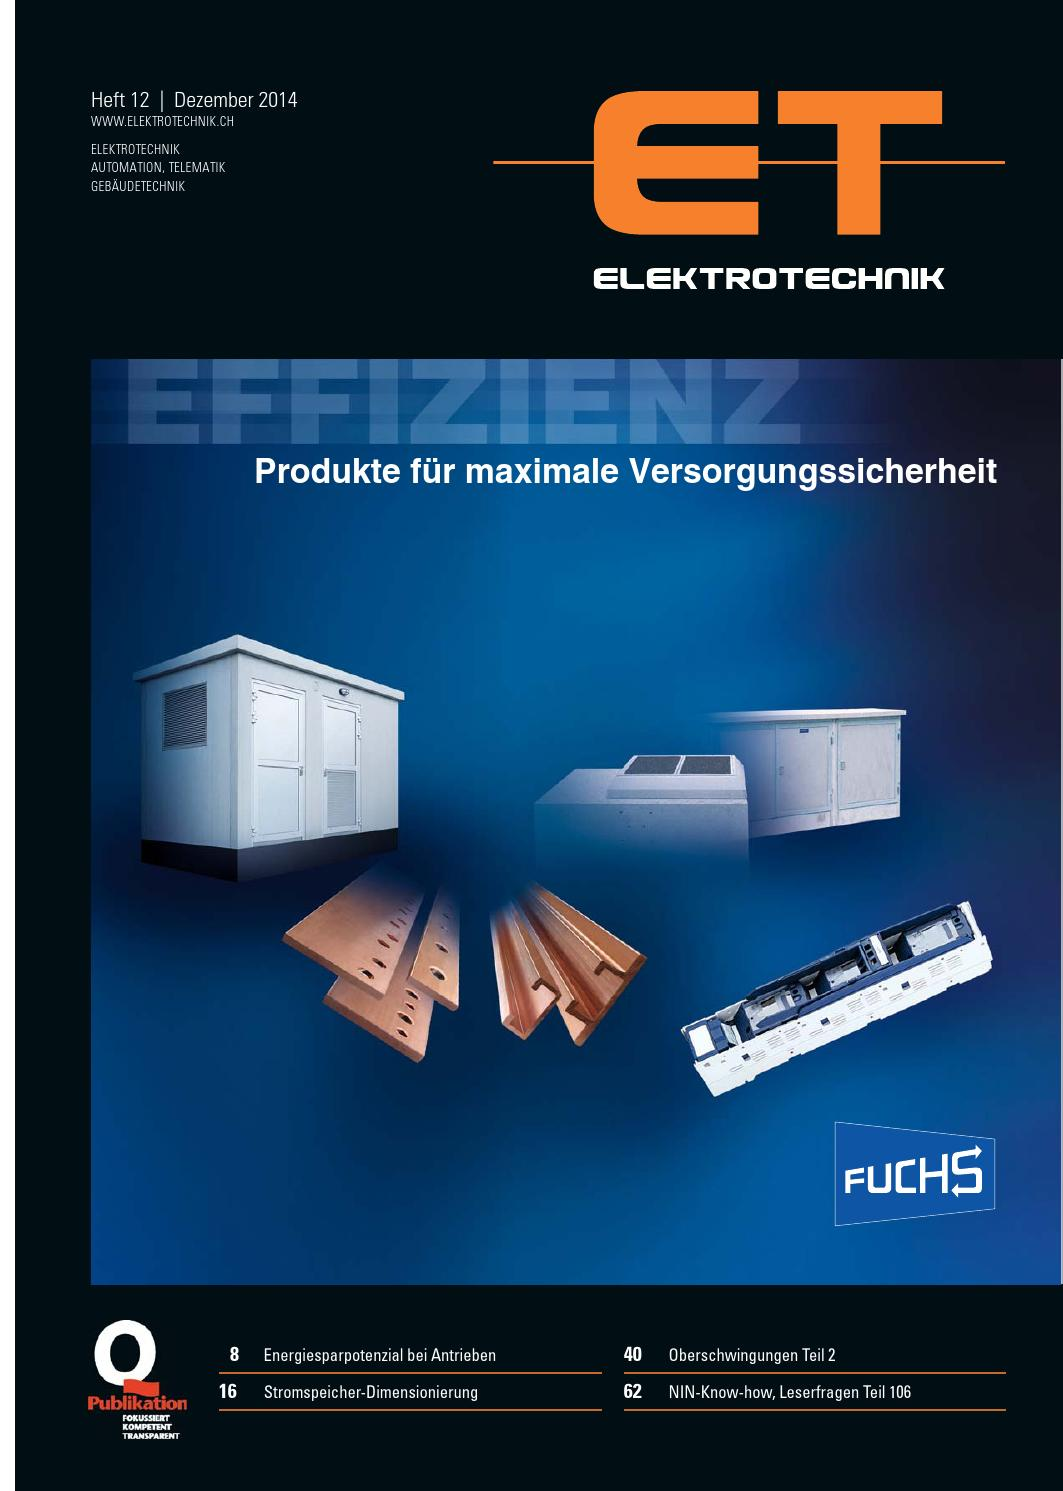 Elektrotechnik 12/2014 by AZ Fachverlage AG - issuu